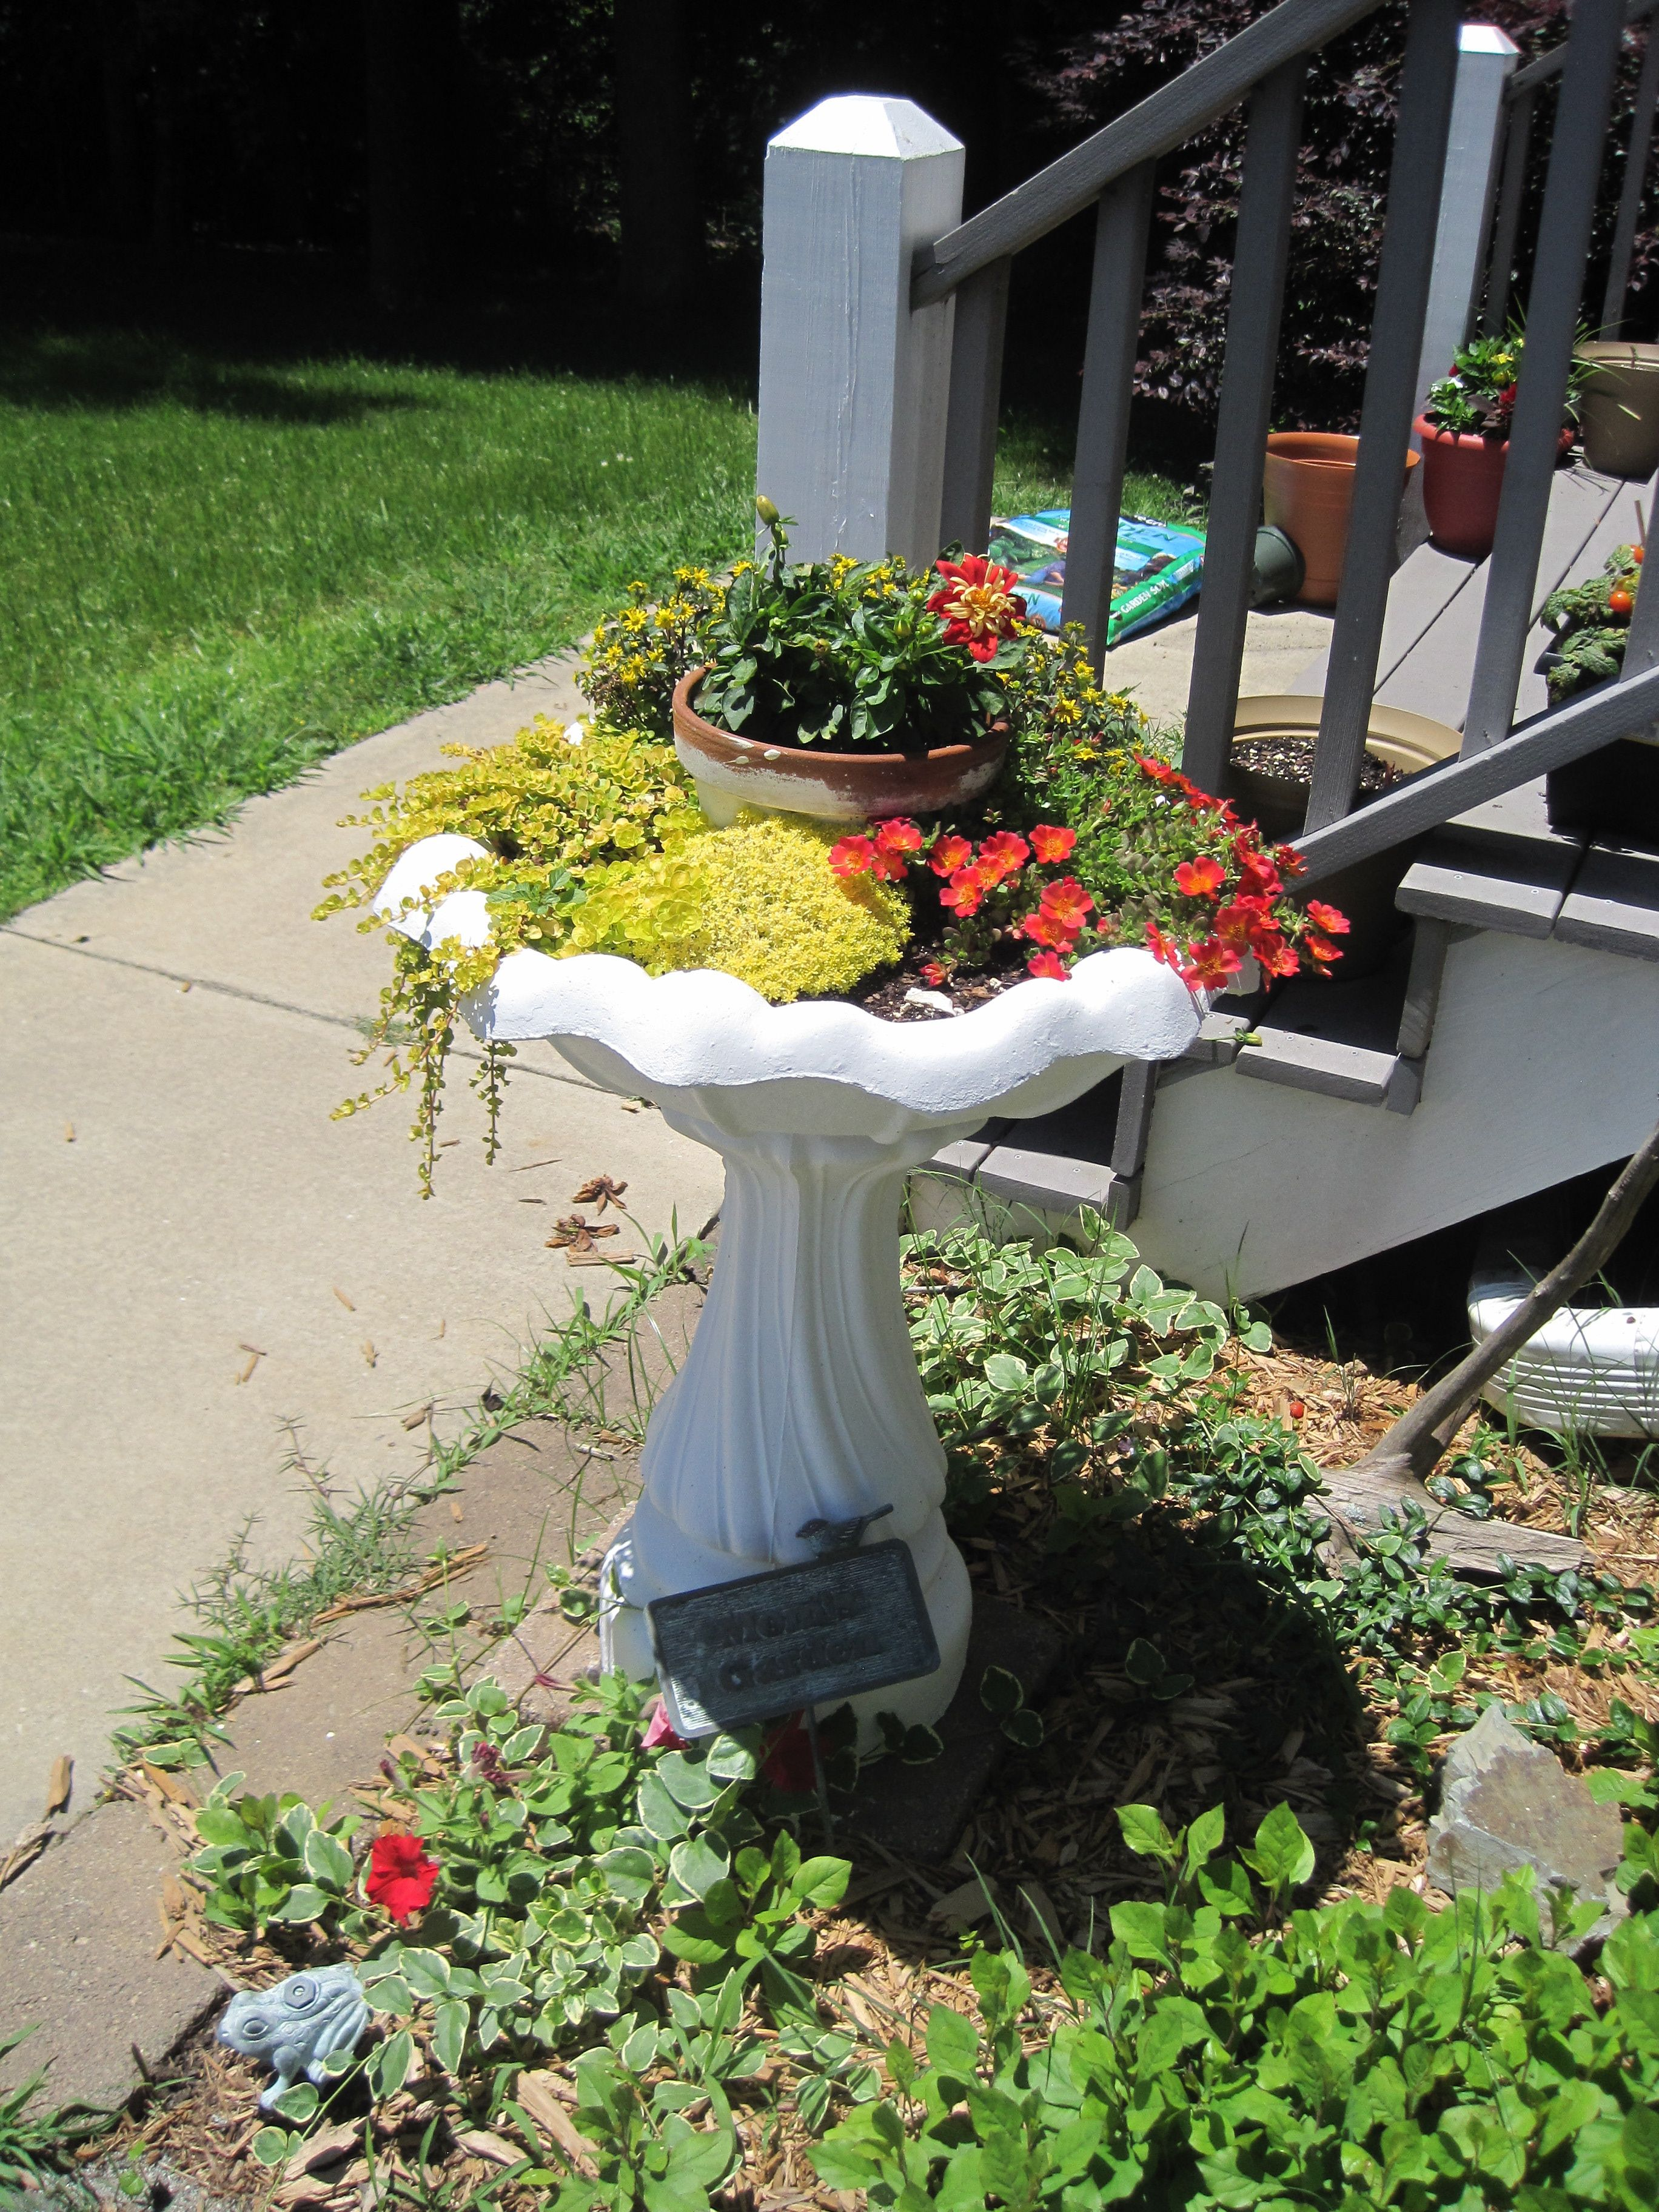 bird bath planter | Patio plants, Bird bath planter, Birds ... on Birds Backyard Landscapes id=90932